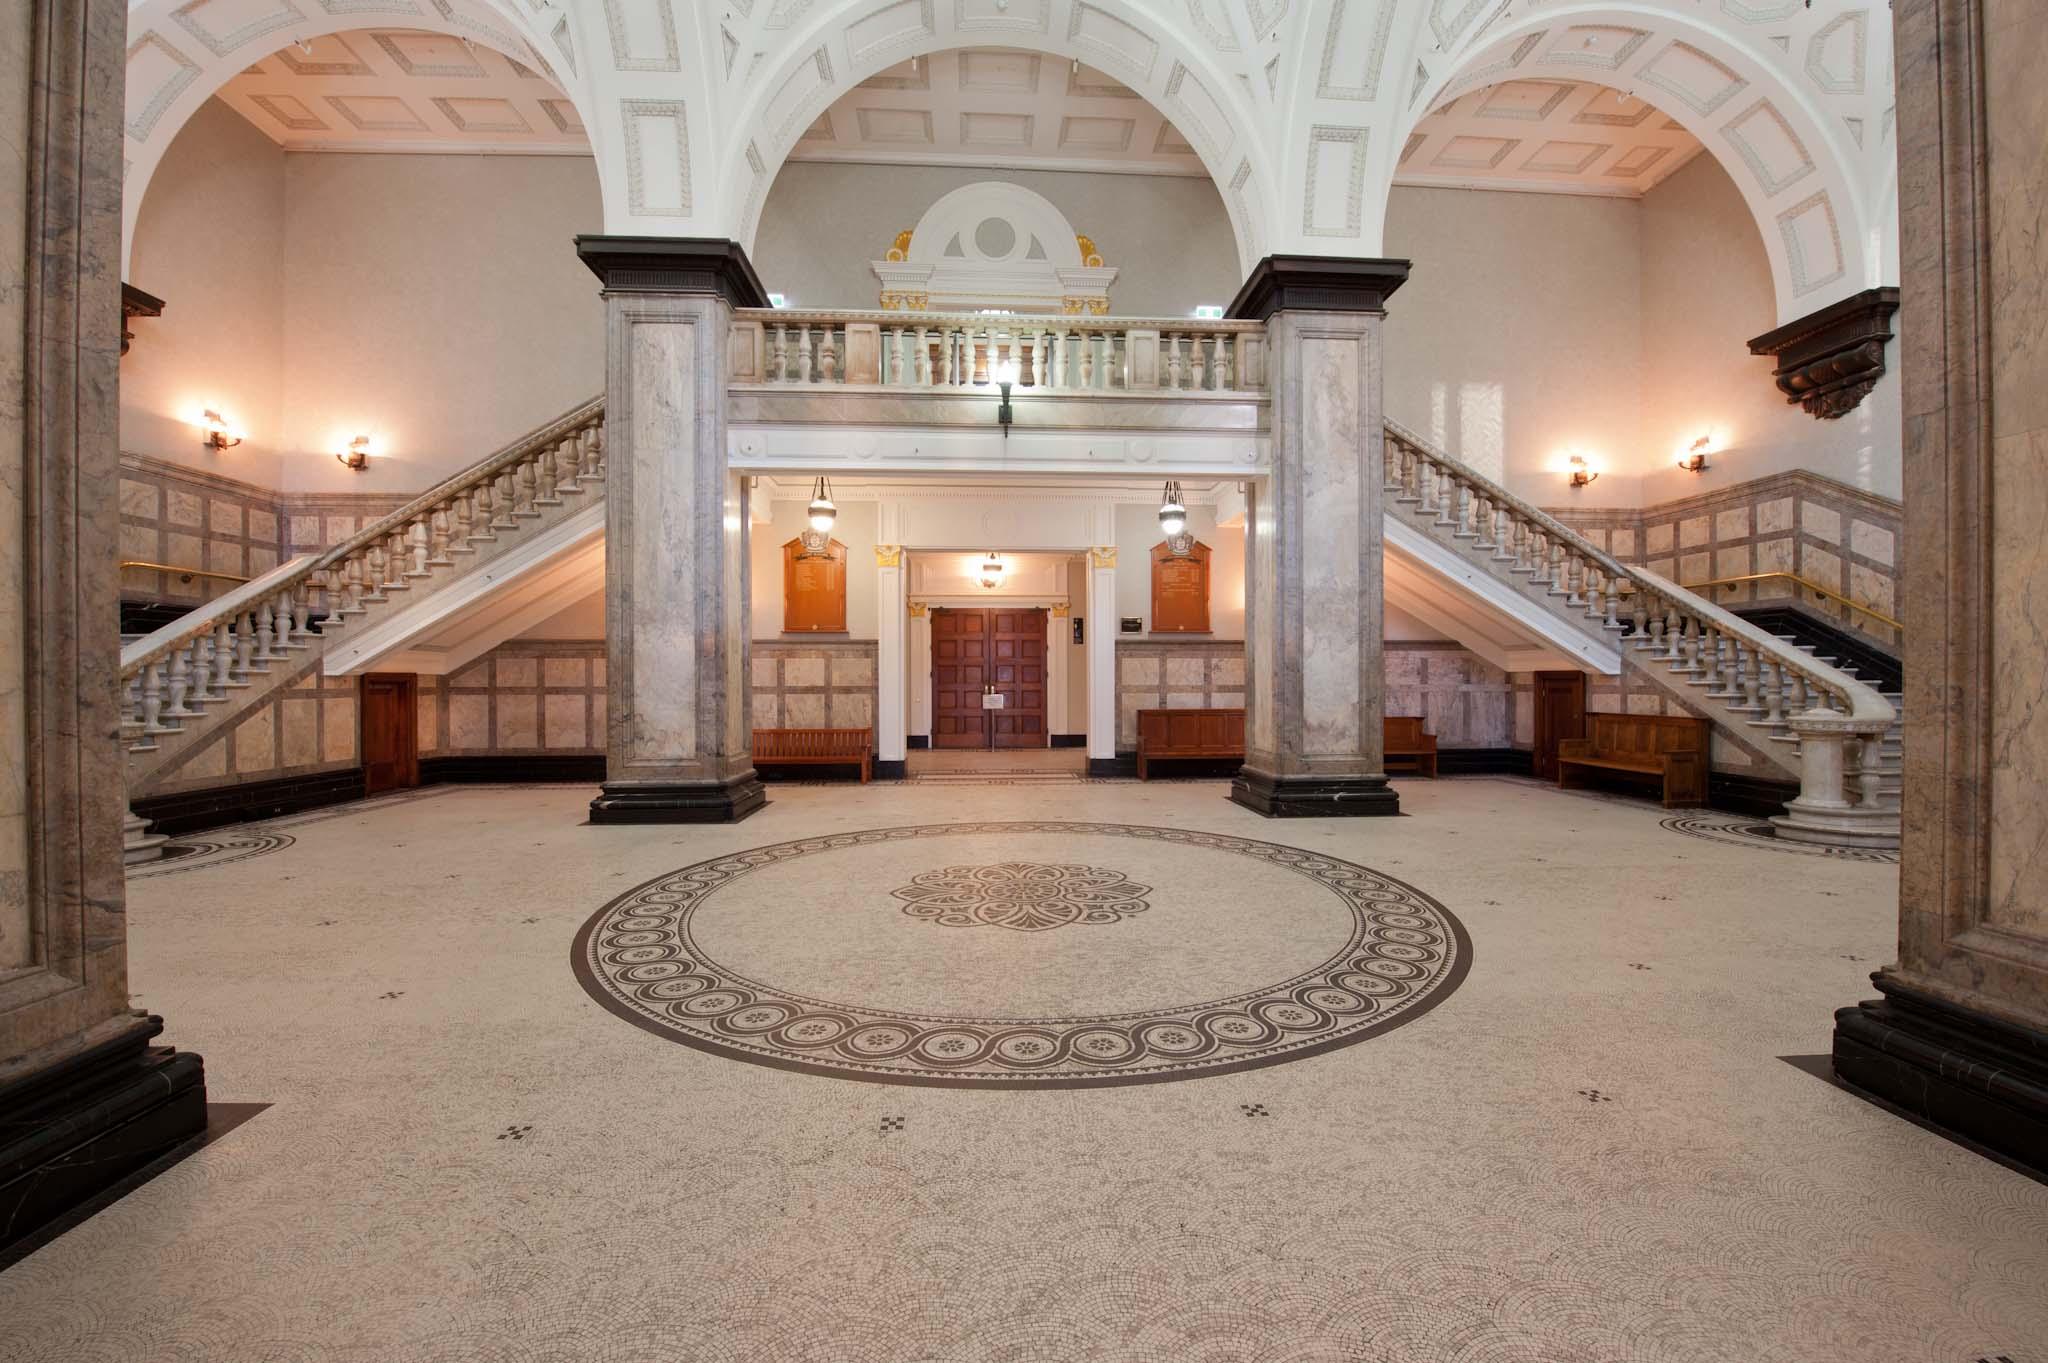 Brisbane City Town Hall 布里斯班市政厅大厅澳洲布里斯班旅游攻略